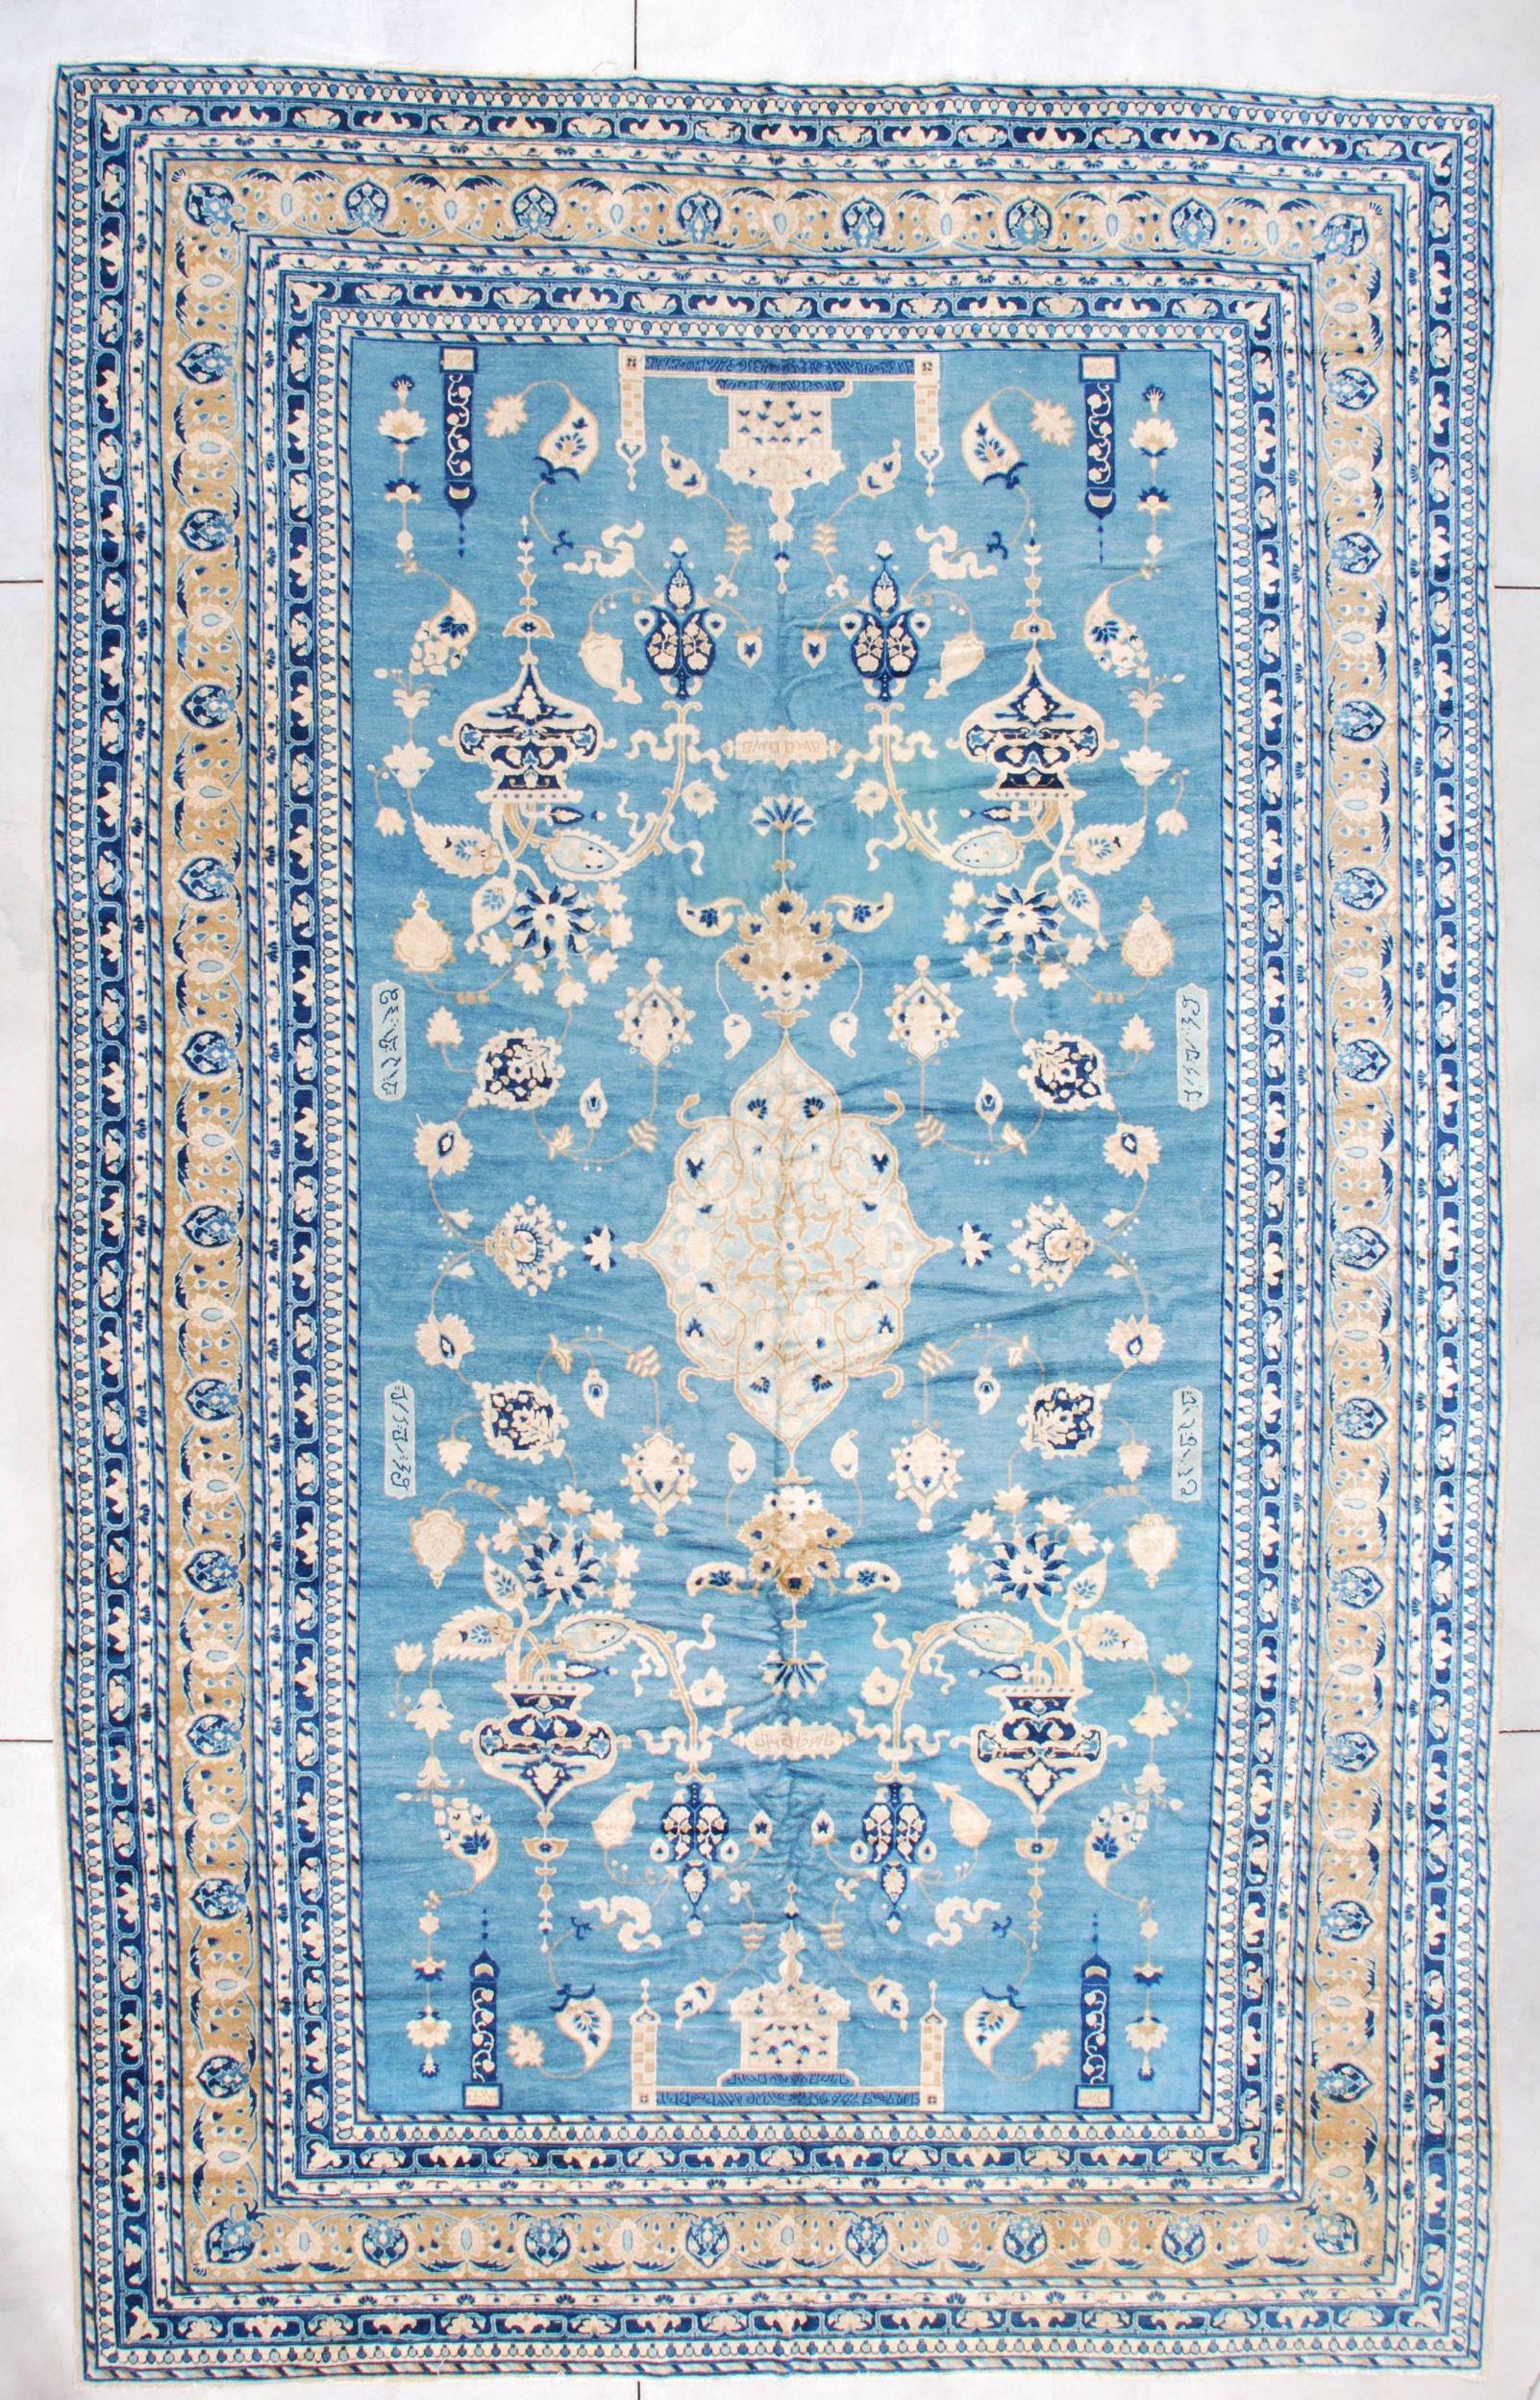 7255 Antique India Rug Signed Ghazan 10